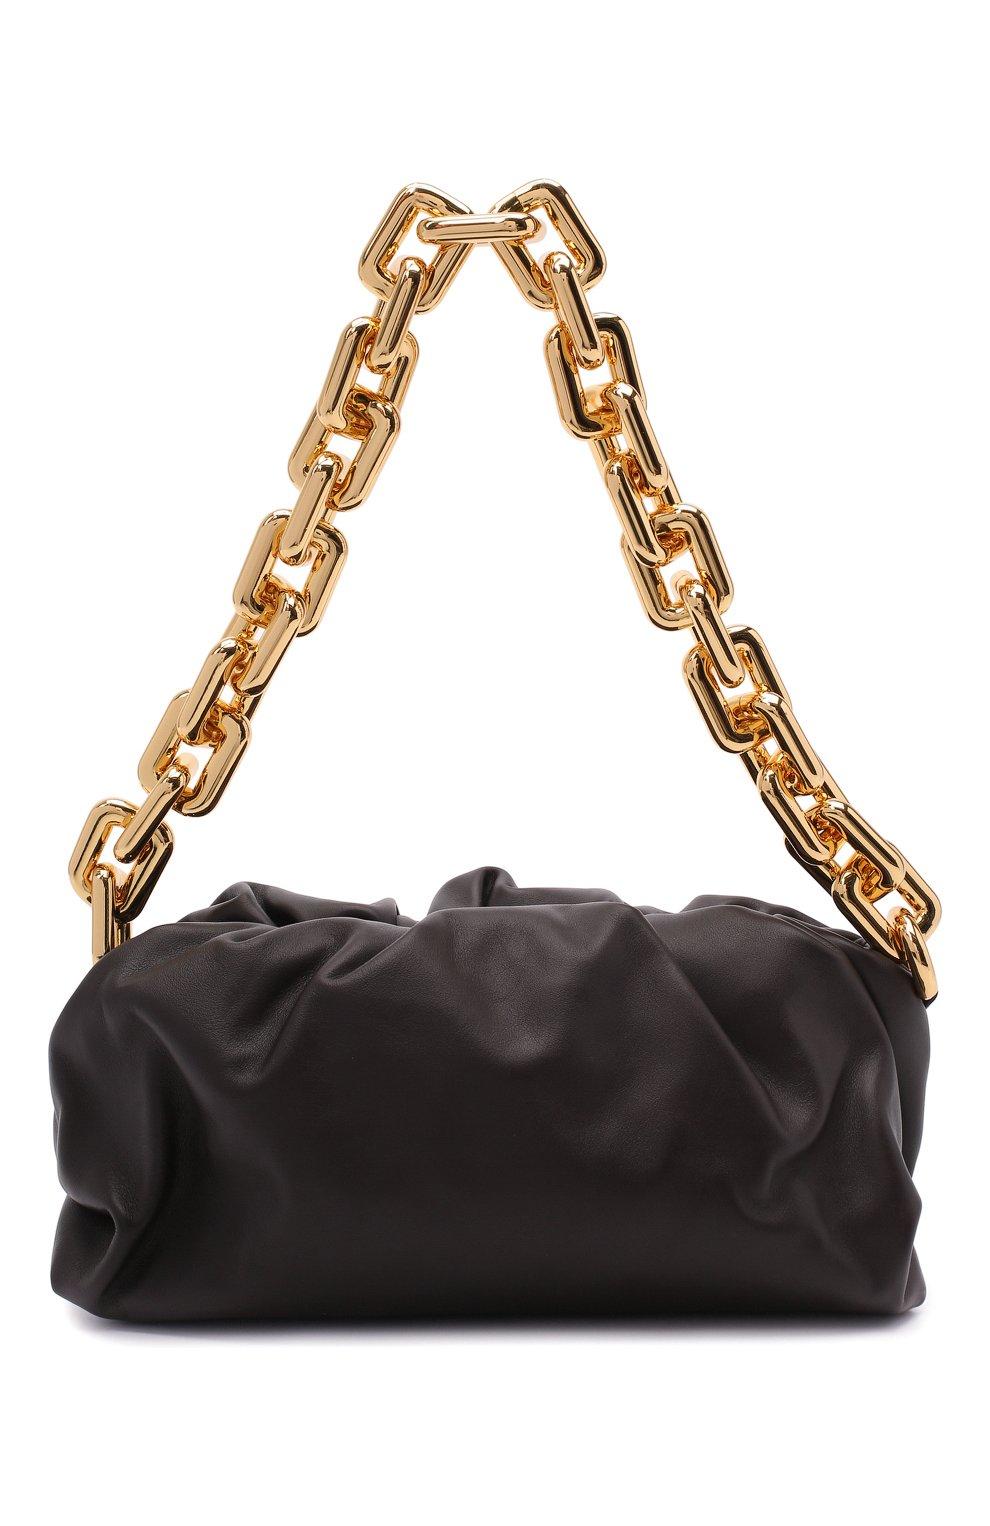 Женская сумка chain pouch BOTTEGA VENETA темно-коричневого цвета, арт. 620230/VCP40   Фото 1